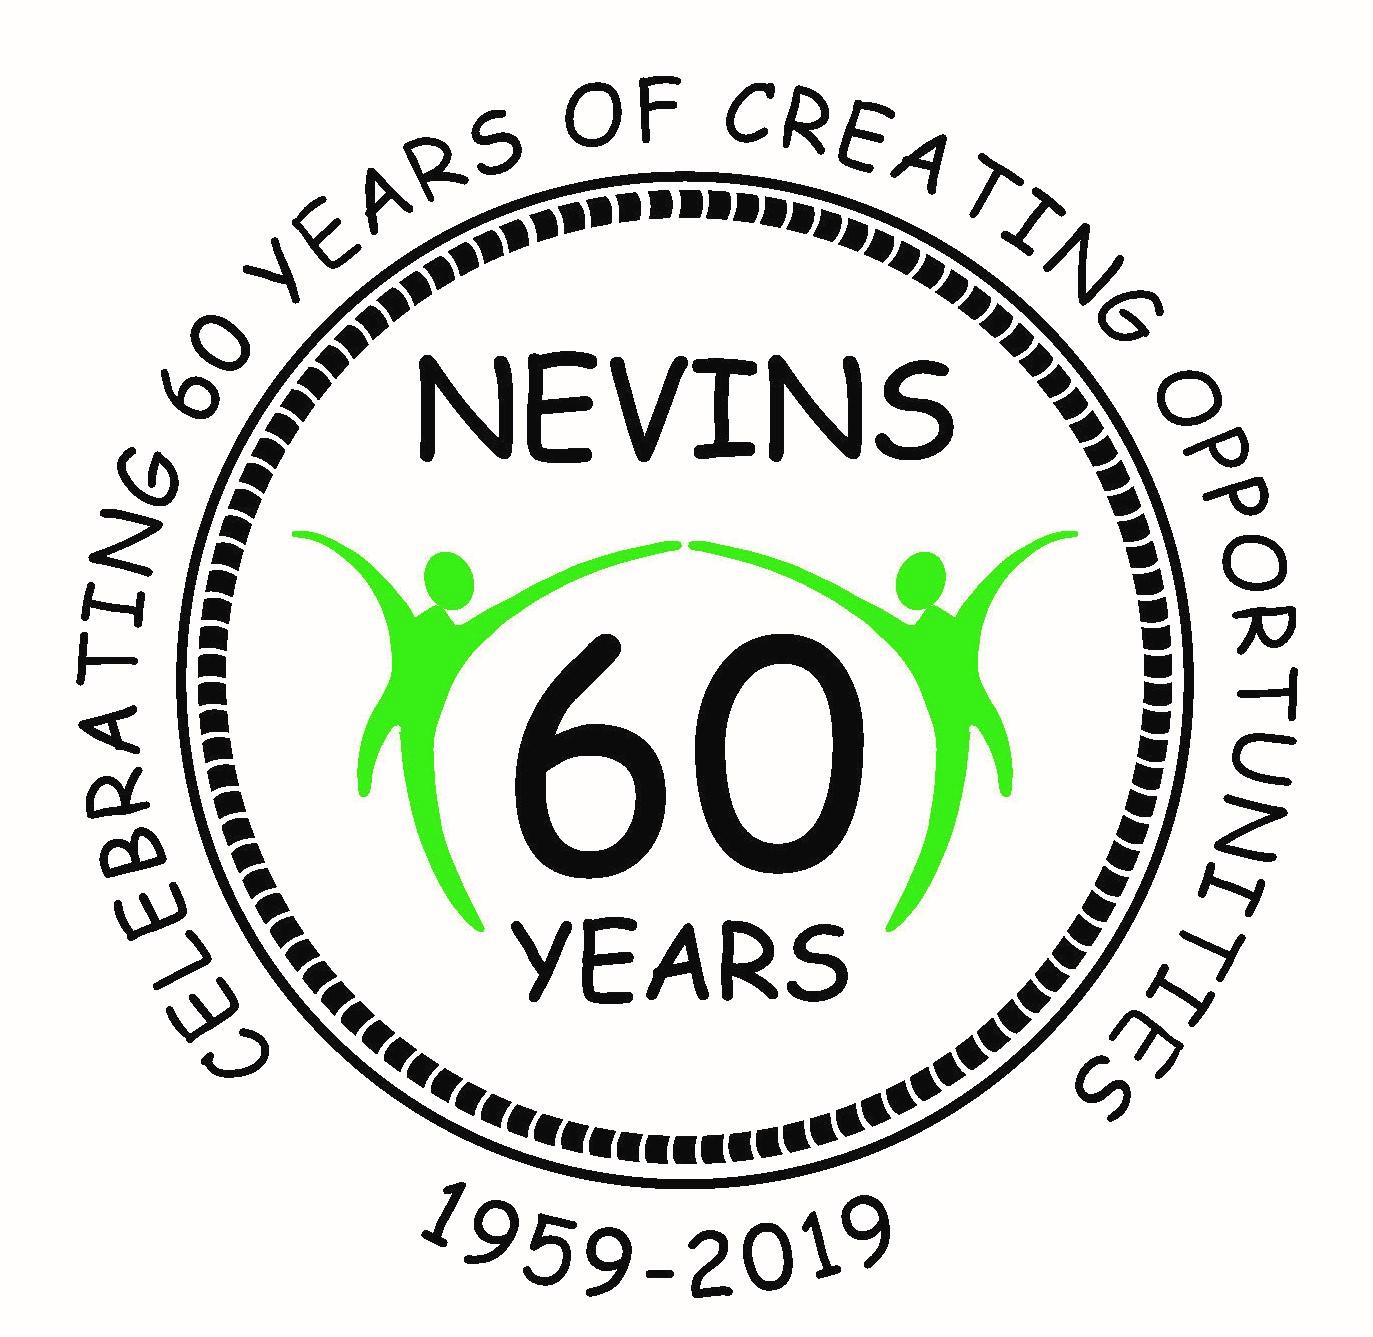 nevins_60th logo pic